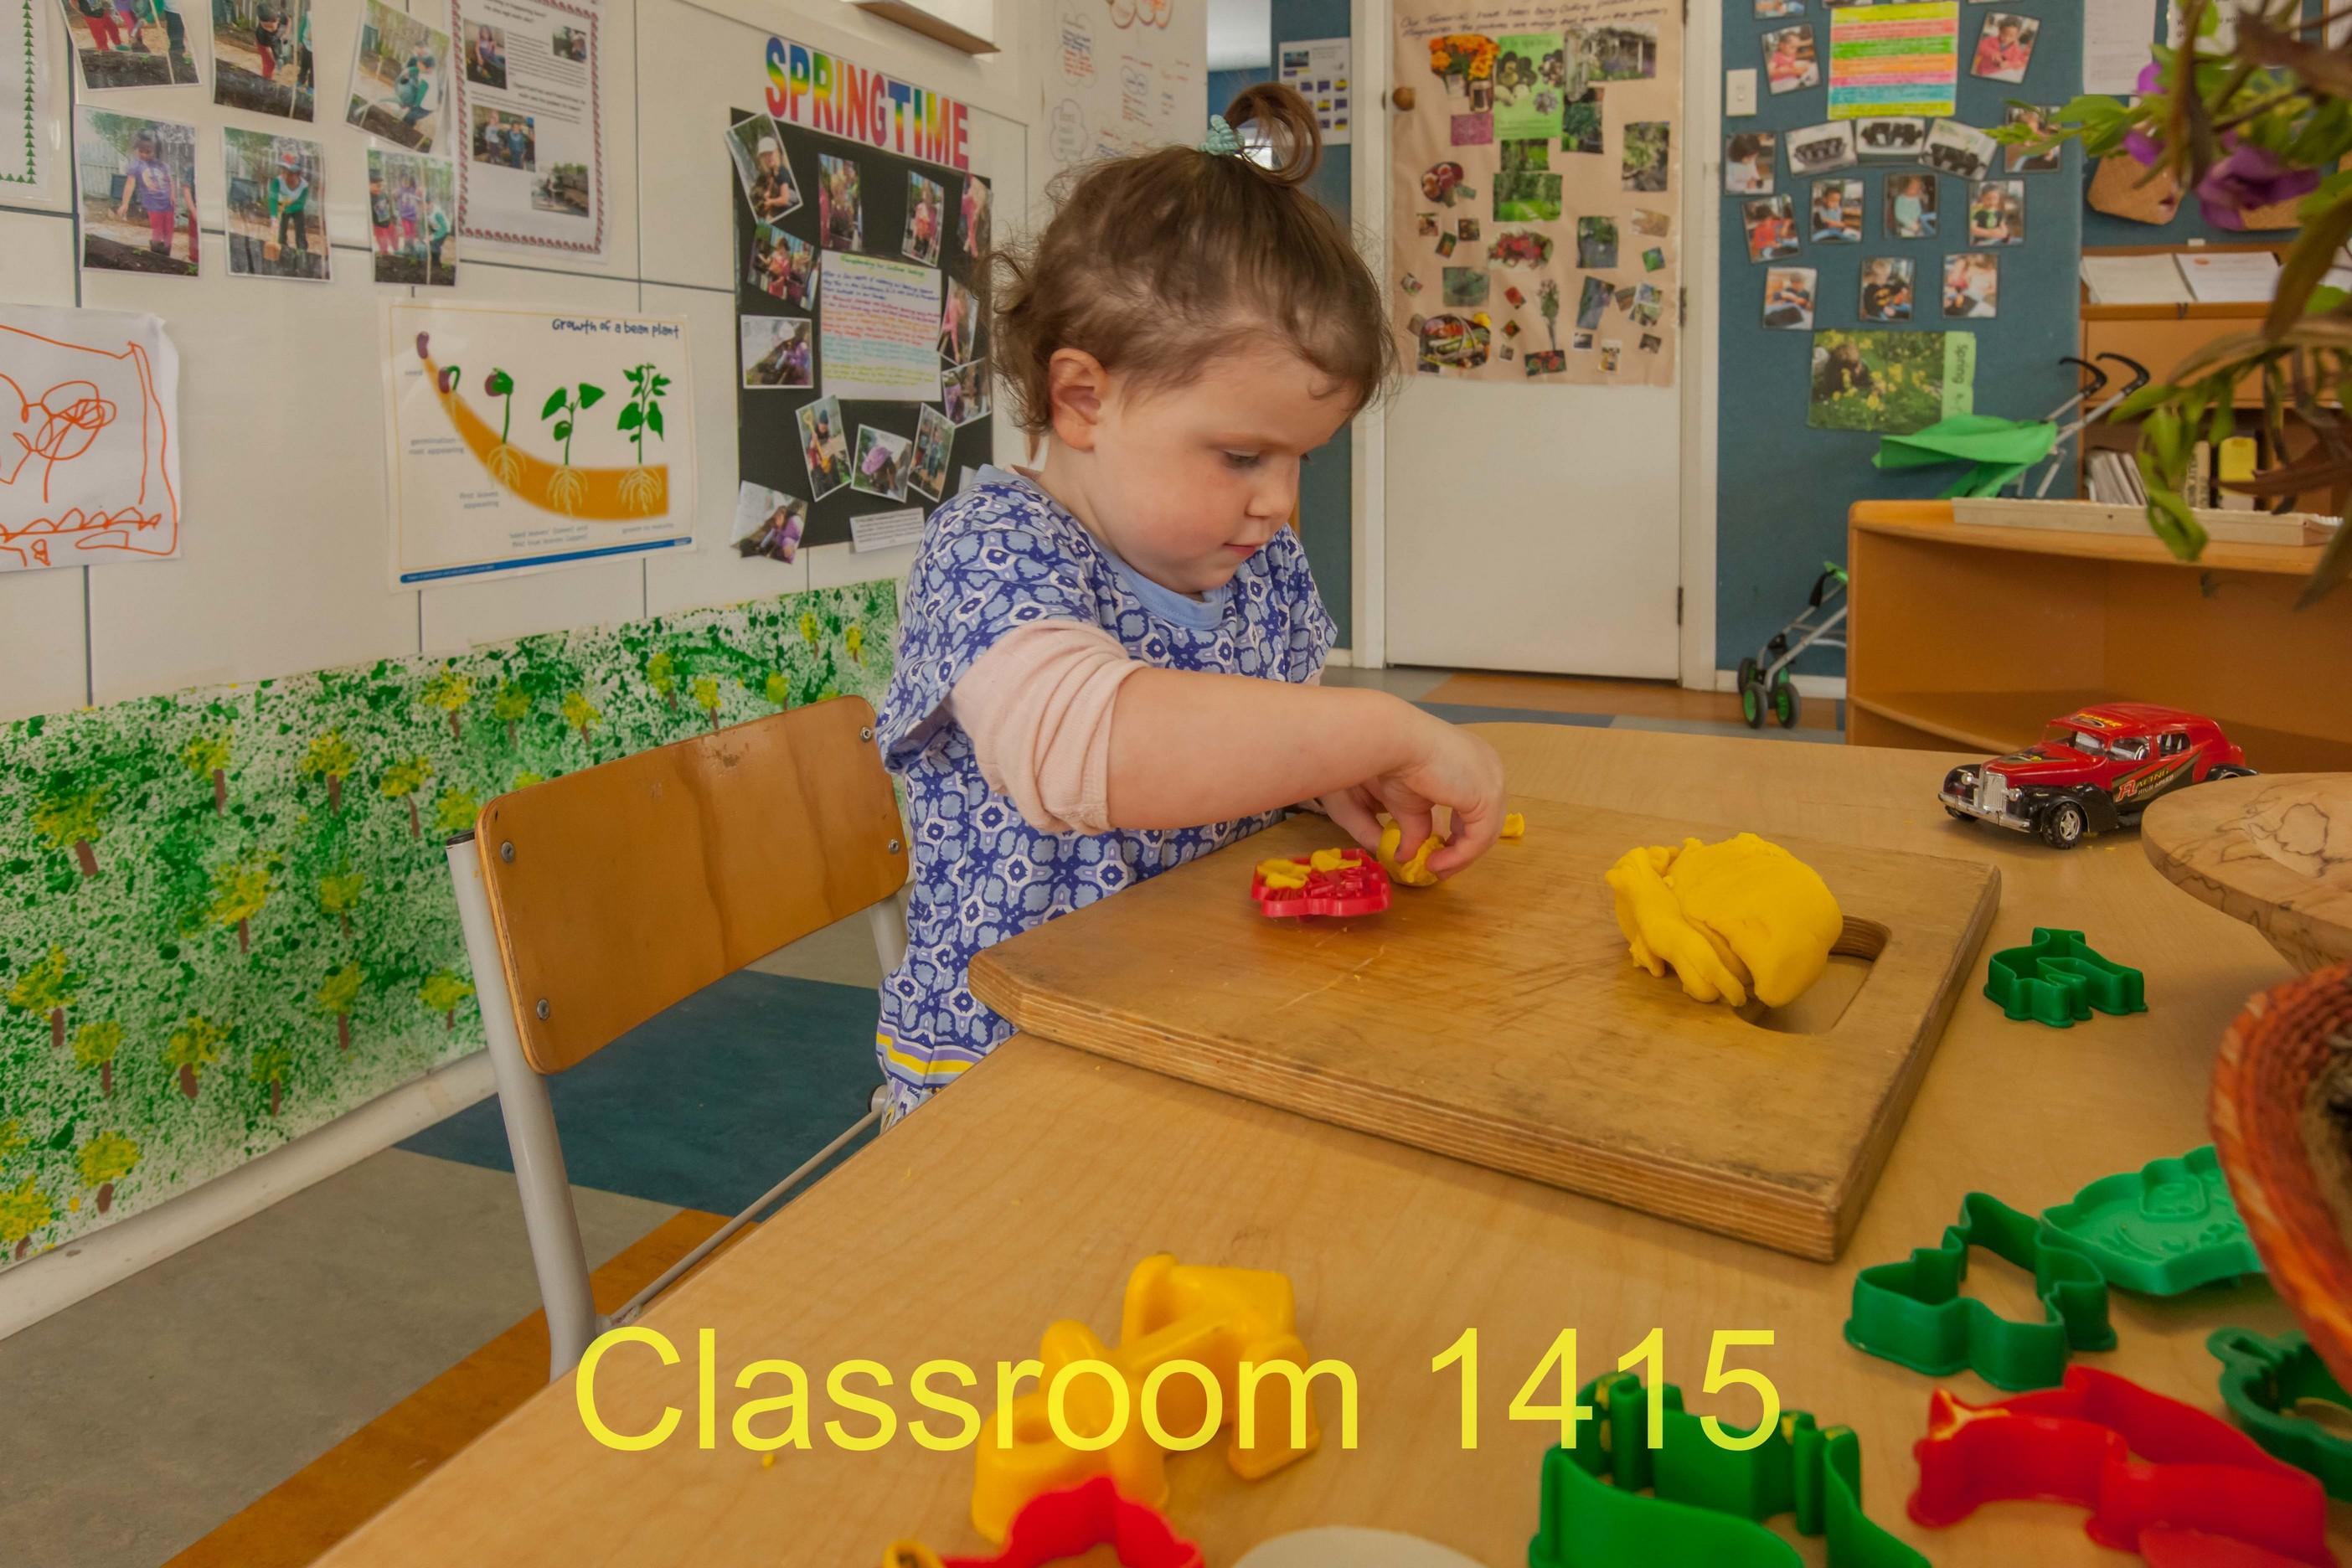 Classroom 1415